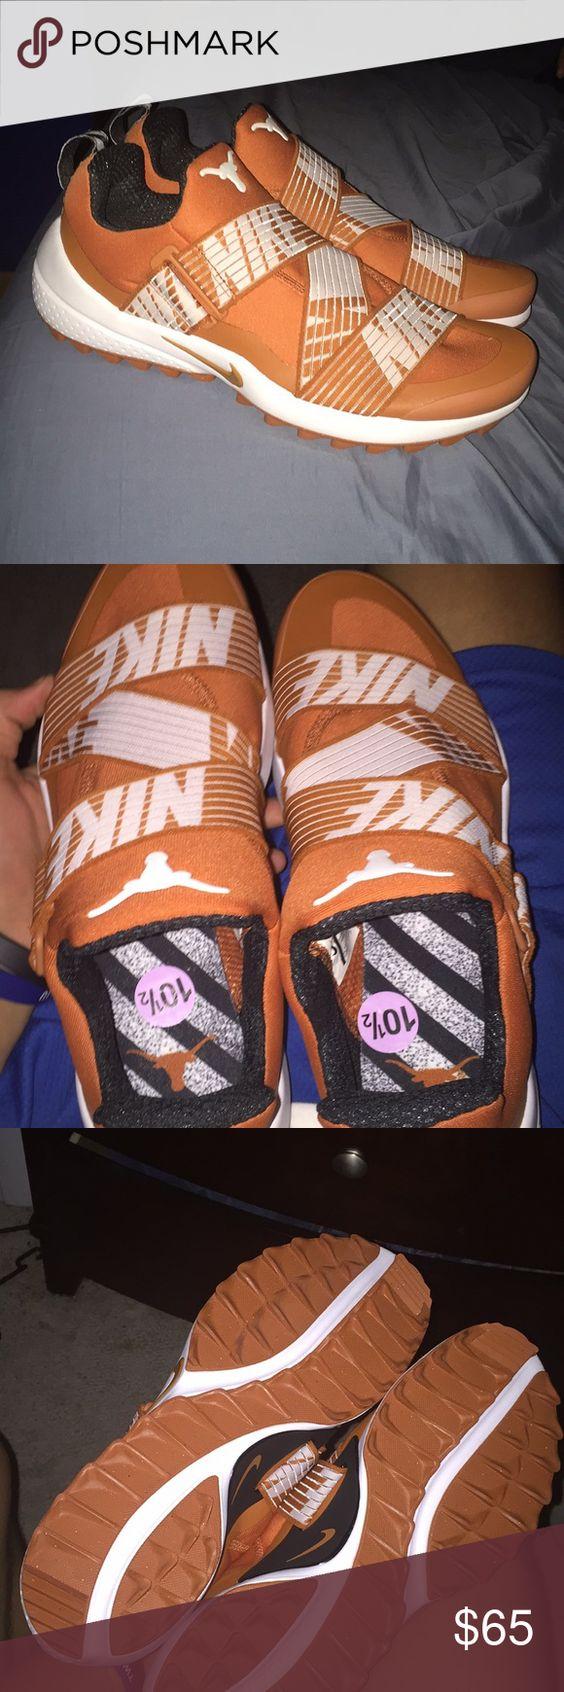 Brilliant Trainers Shoes